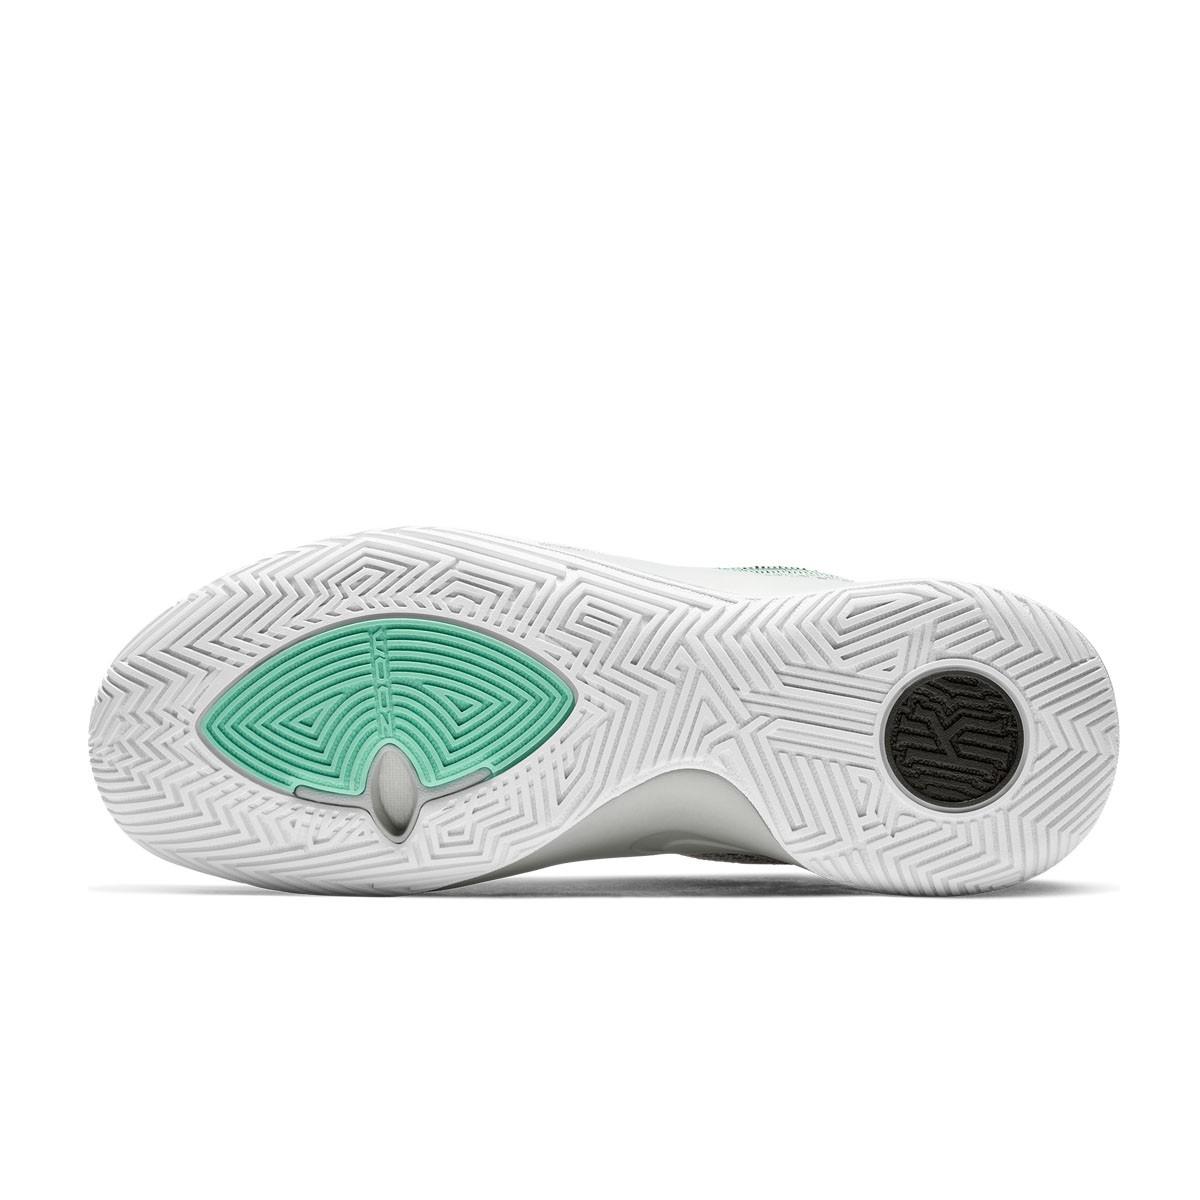 Nike Kyrie Flytrap II GS 'Grey Turqoise' AO4436-003-Jr